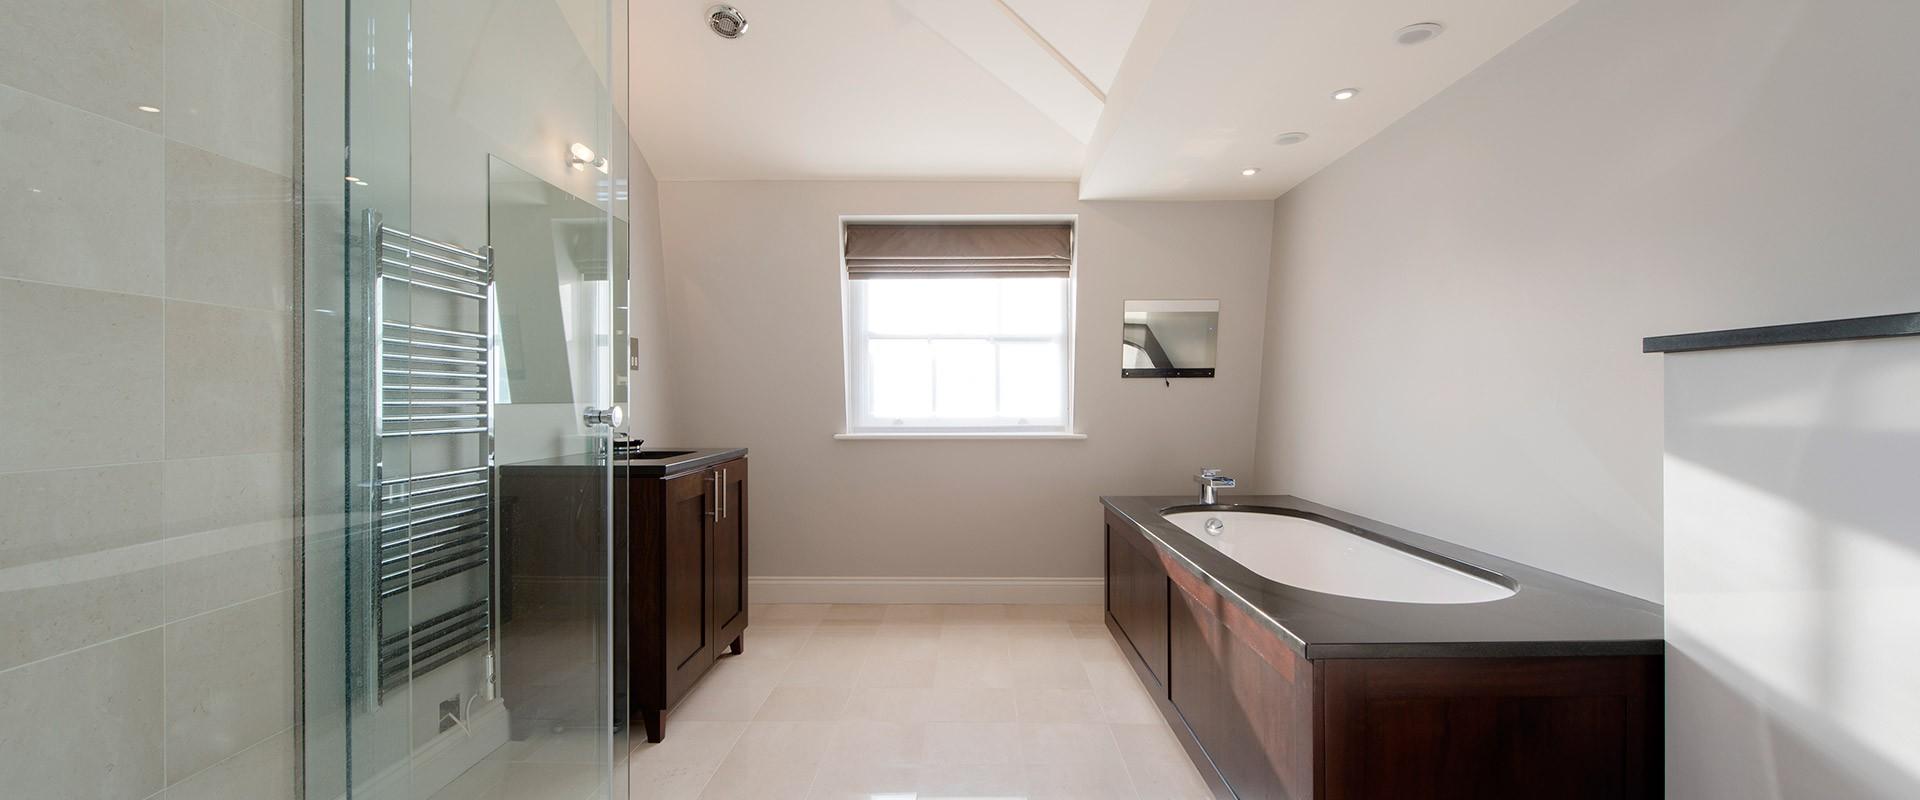 Bespoke Shower Installations